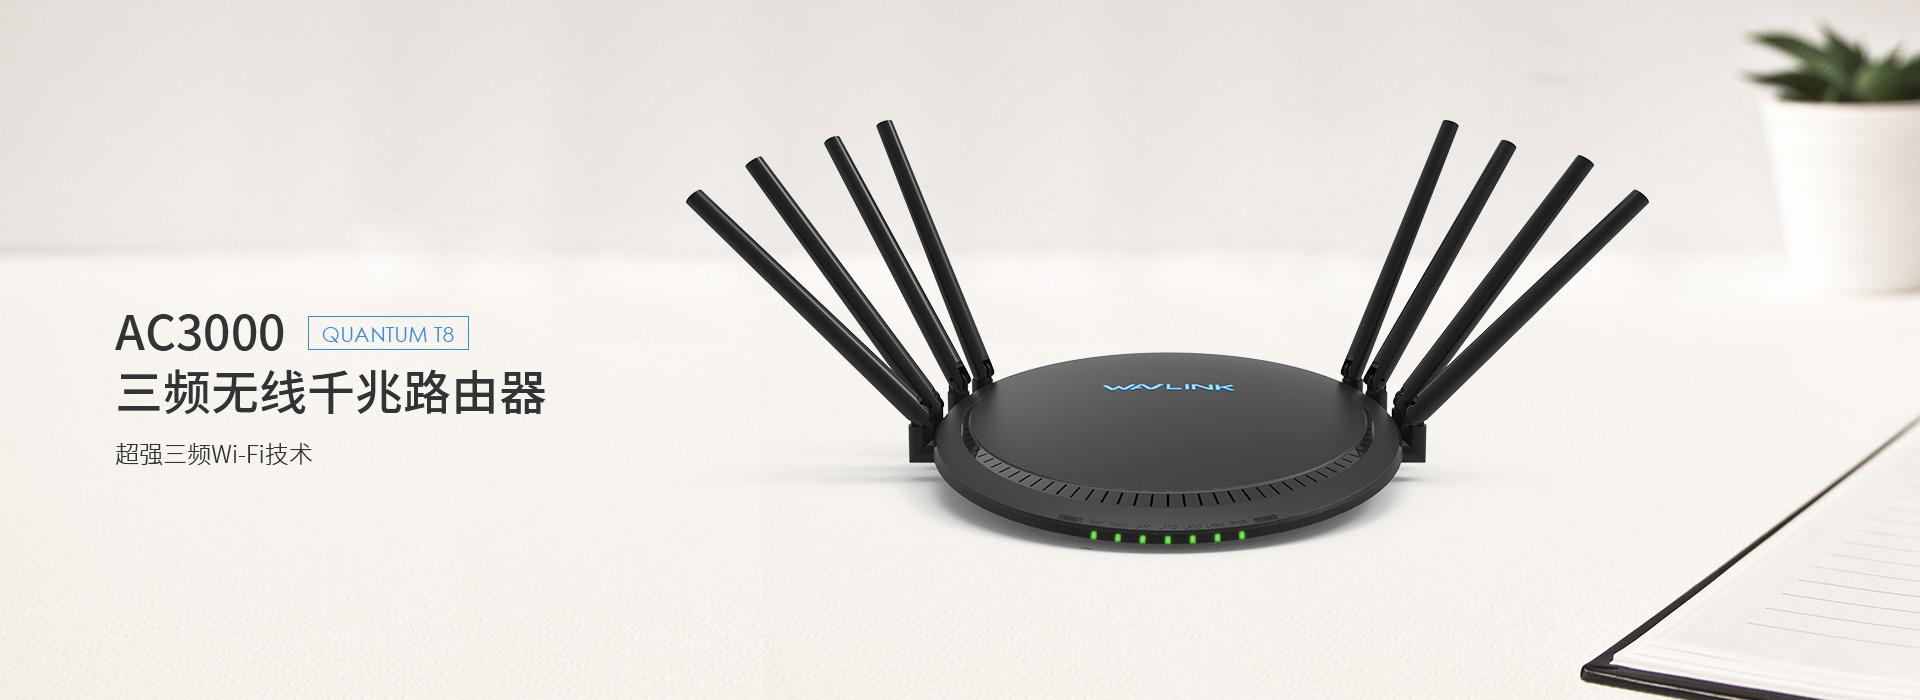 QUANTUM T8 3000M三频智能无线路由器 支持Touchlink技术